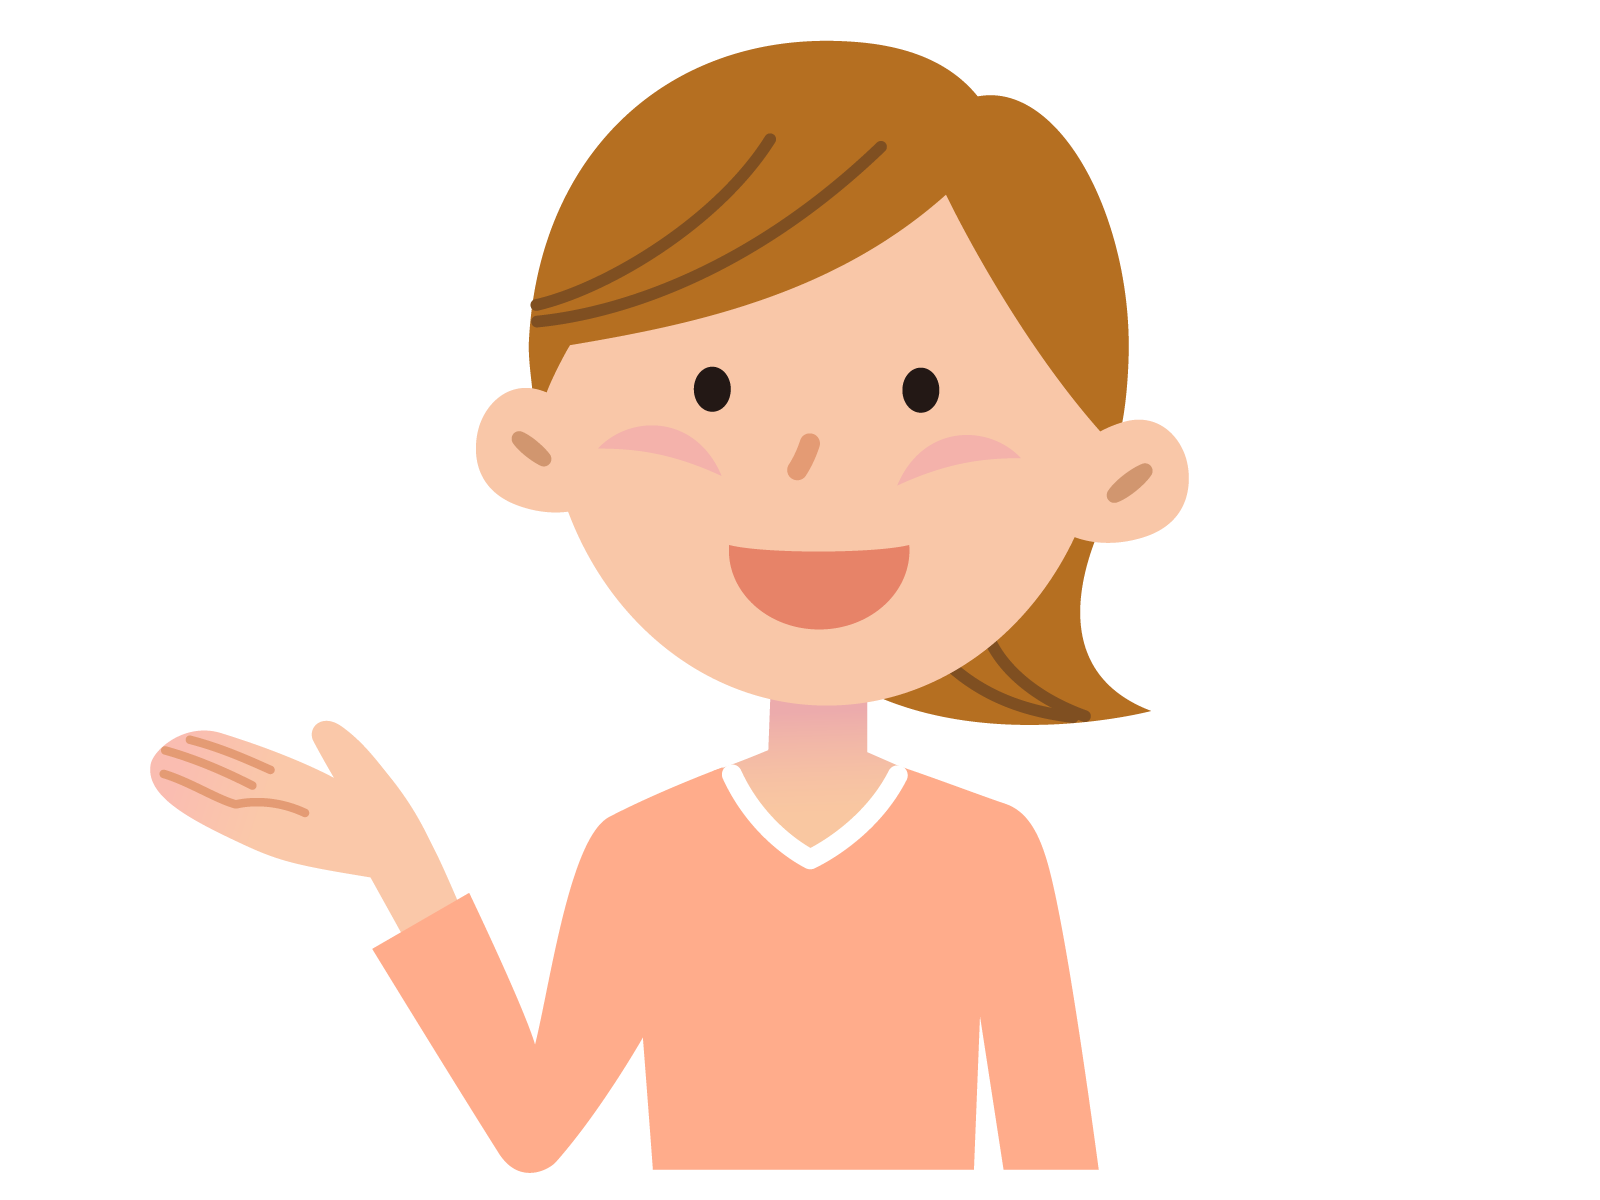 WordPress講座、Illustrator基礎講座の記事を更新しました